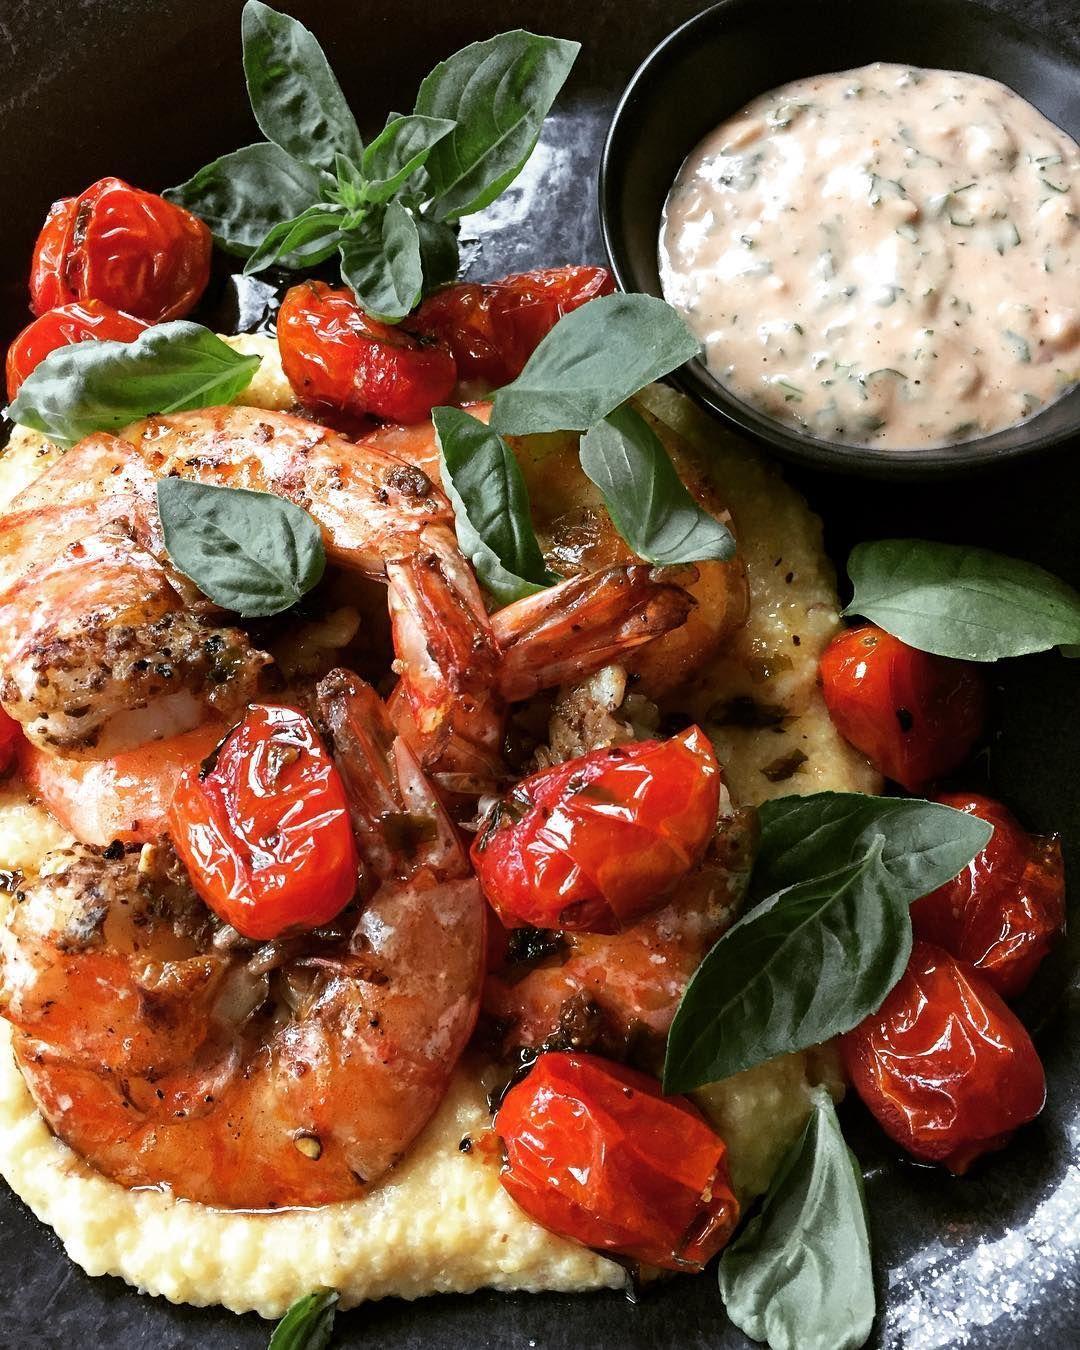 tamaratavel on Instagram Jumbo grilled shrimp with roasted cherry tomatoes a shallot Parmesan polenta and comeback sauce Shrimp and comeback sauce from  Jumbo grilled shr...